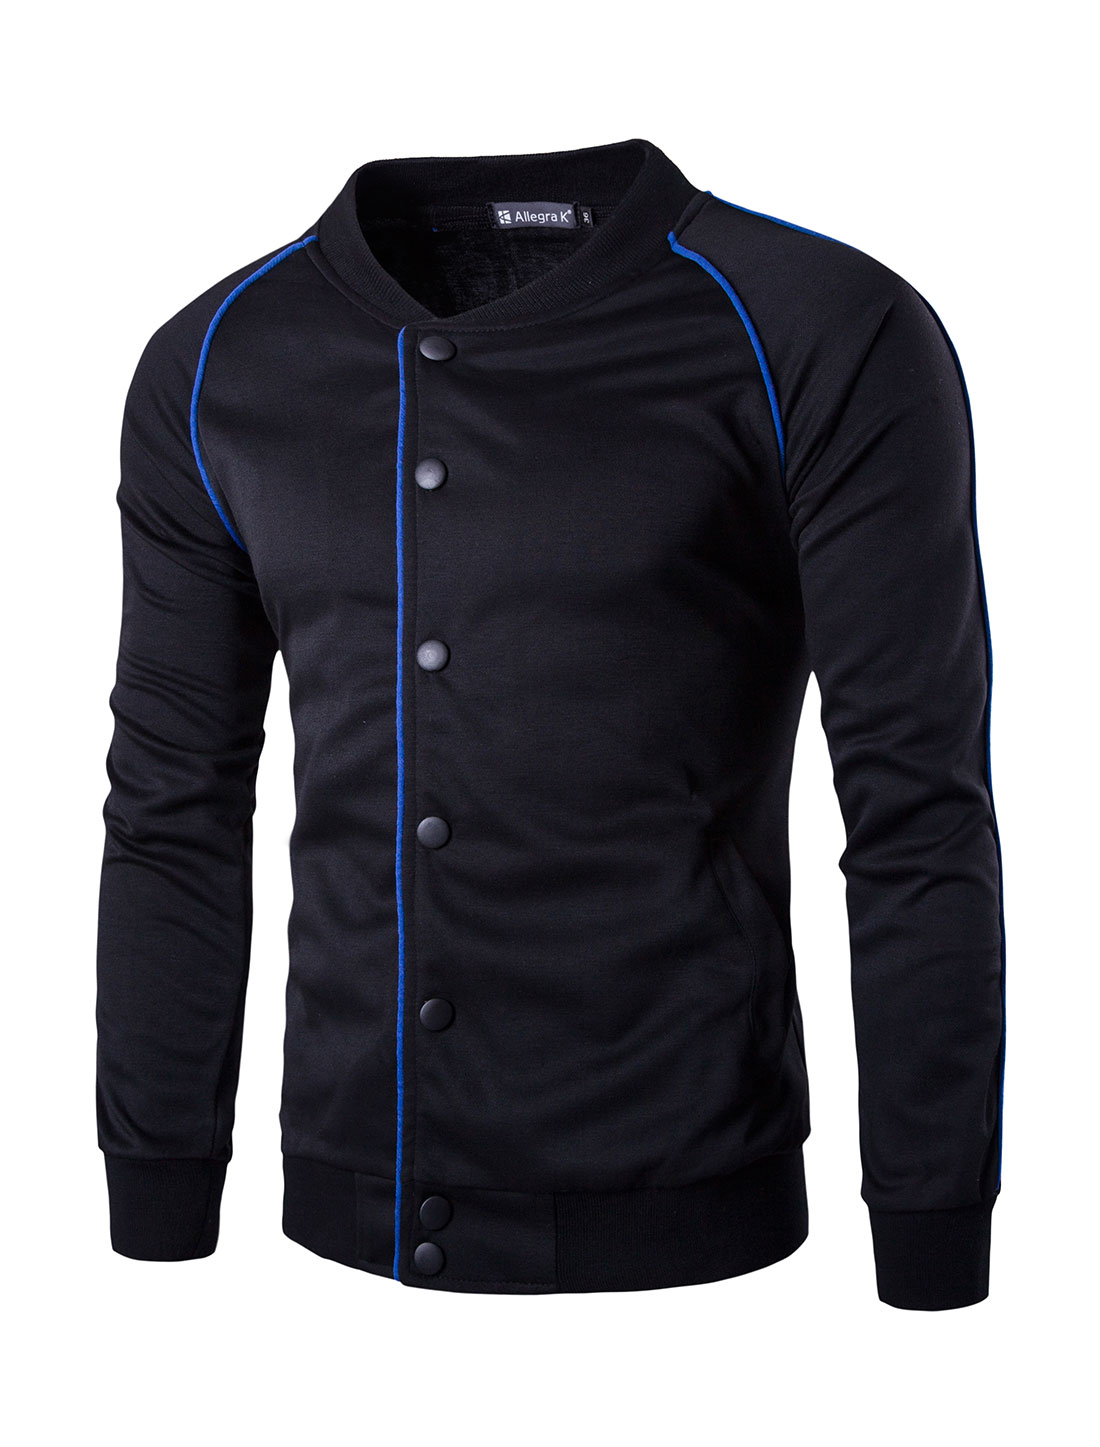 Men Snap Button Fastener Raglan Sleeves Piped Jacket Black L